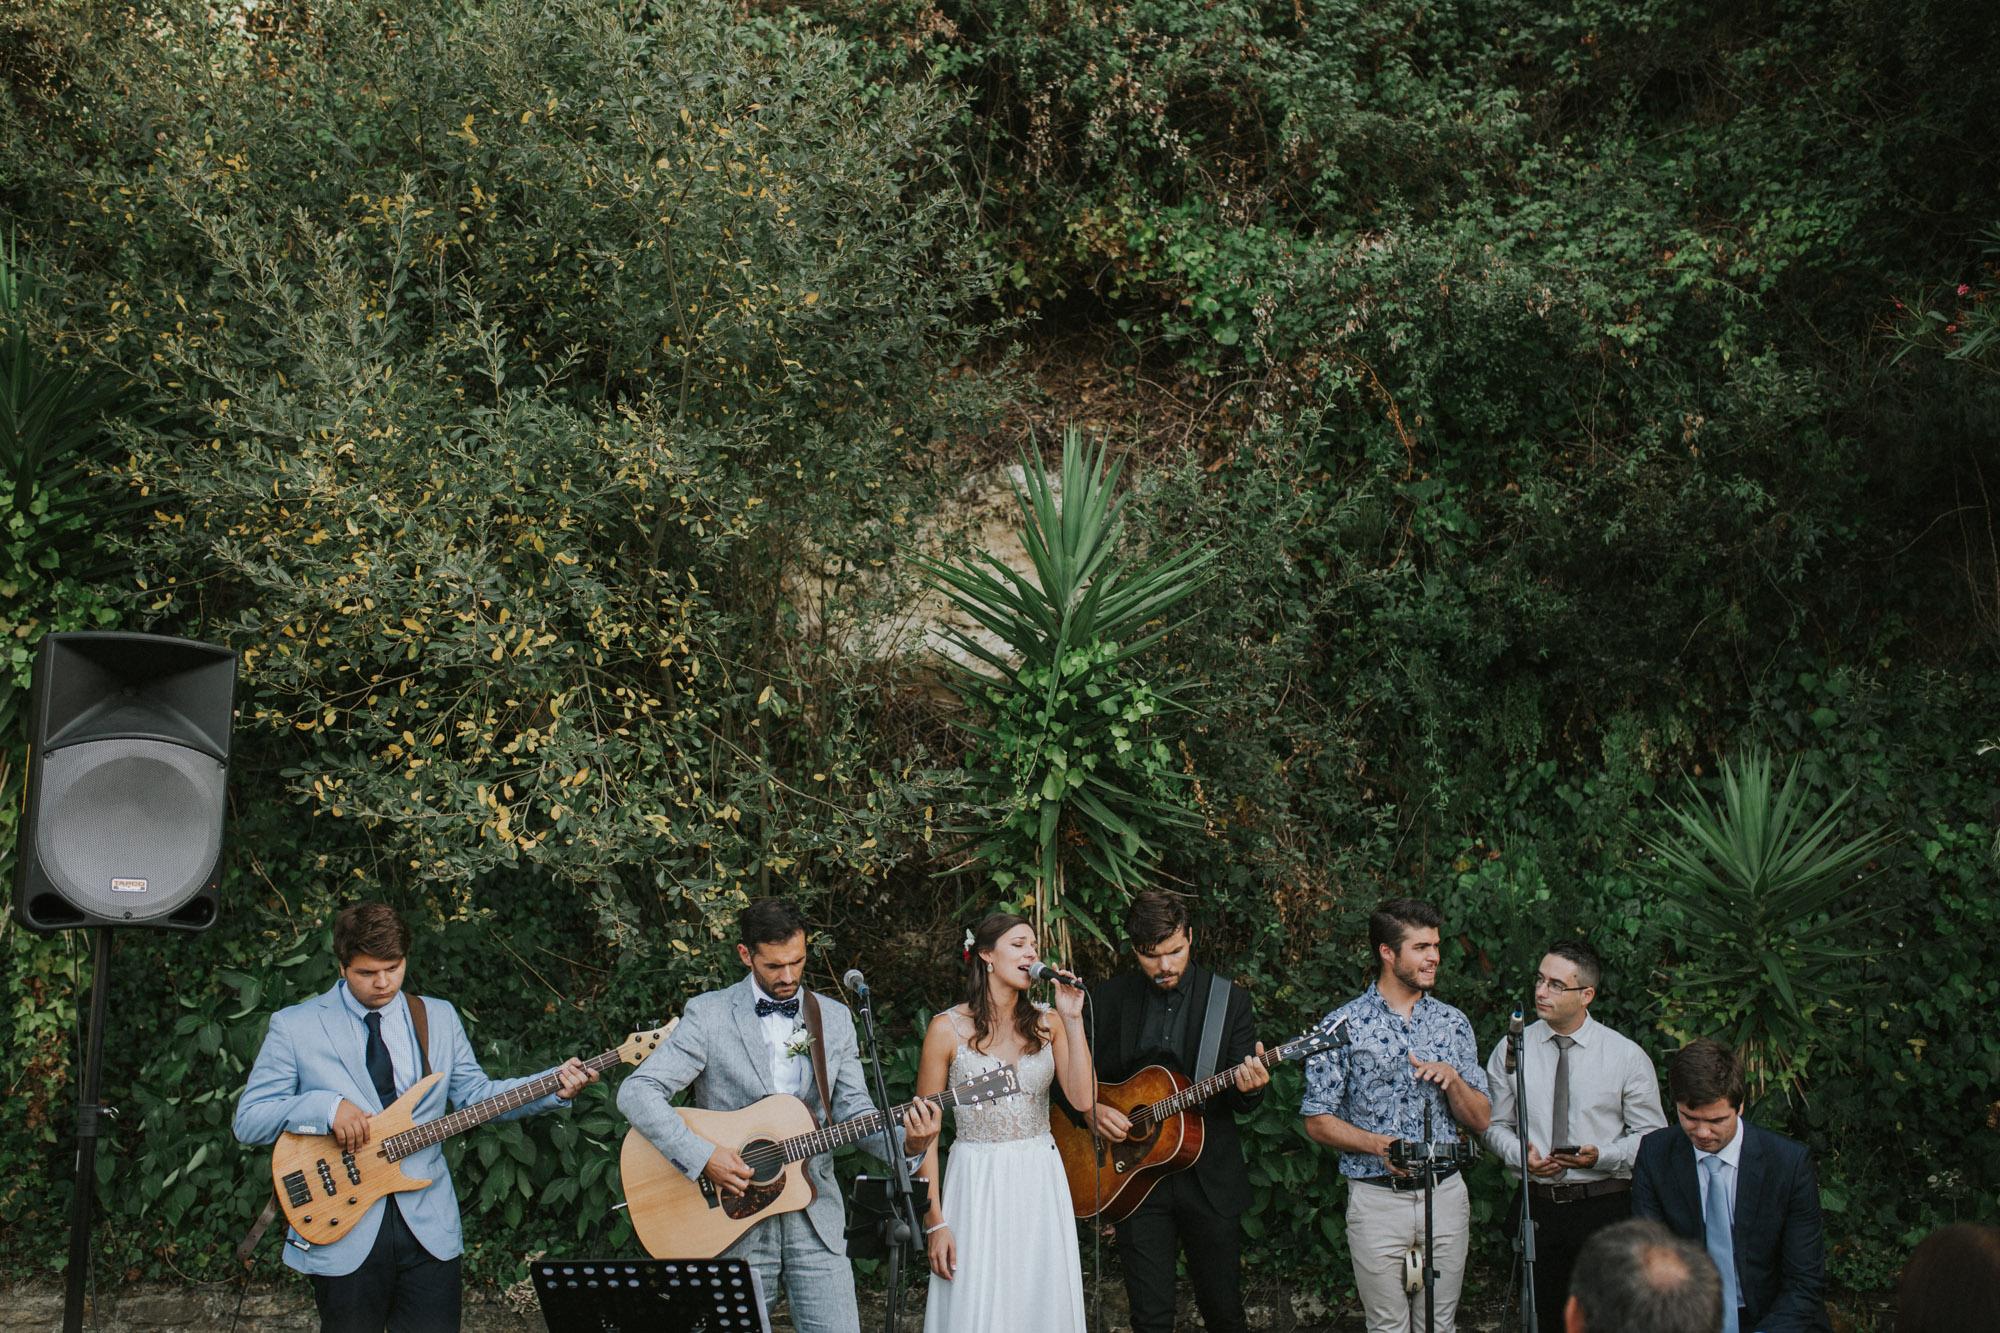 044-carina-e-samuel-wedding-casamento-quinta-dos-rouxinois-rustico-my-fancy-wedding-mafra-malveira-lisboa-sintra-cascais-filipe-santiago-fotografia-fotografo-lifestyle-destination-portugal